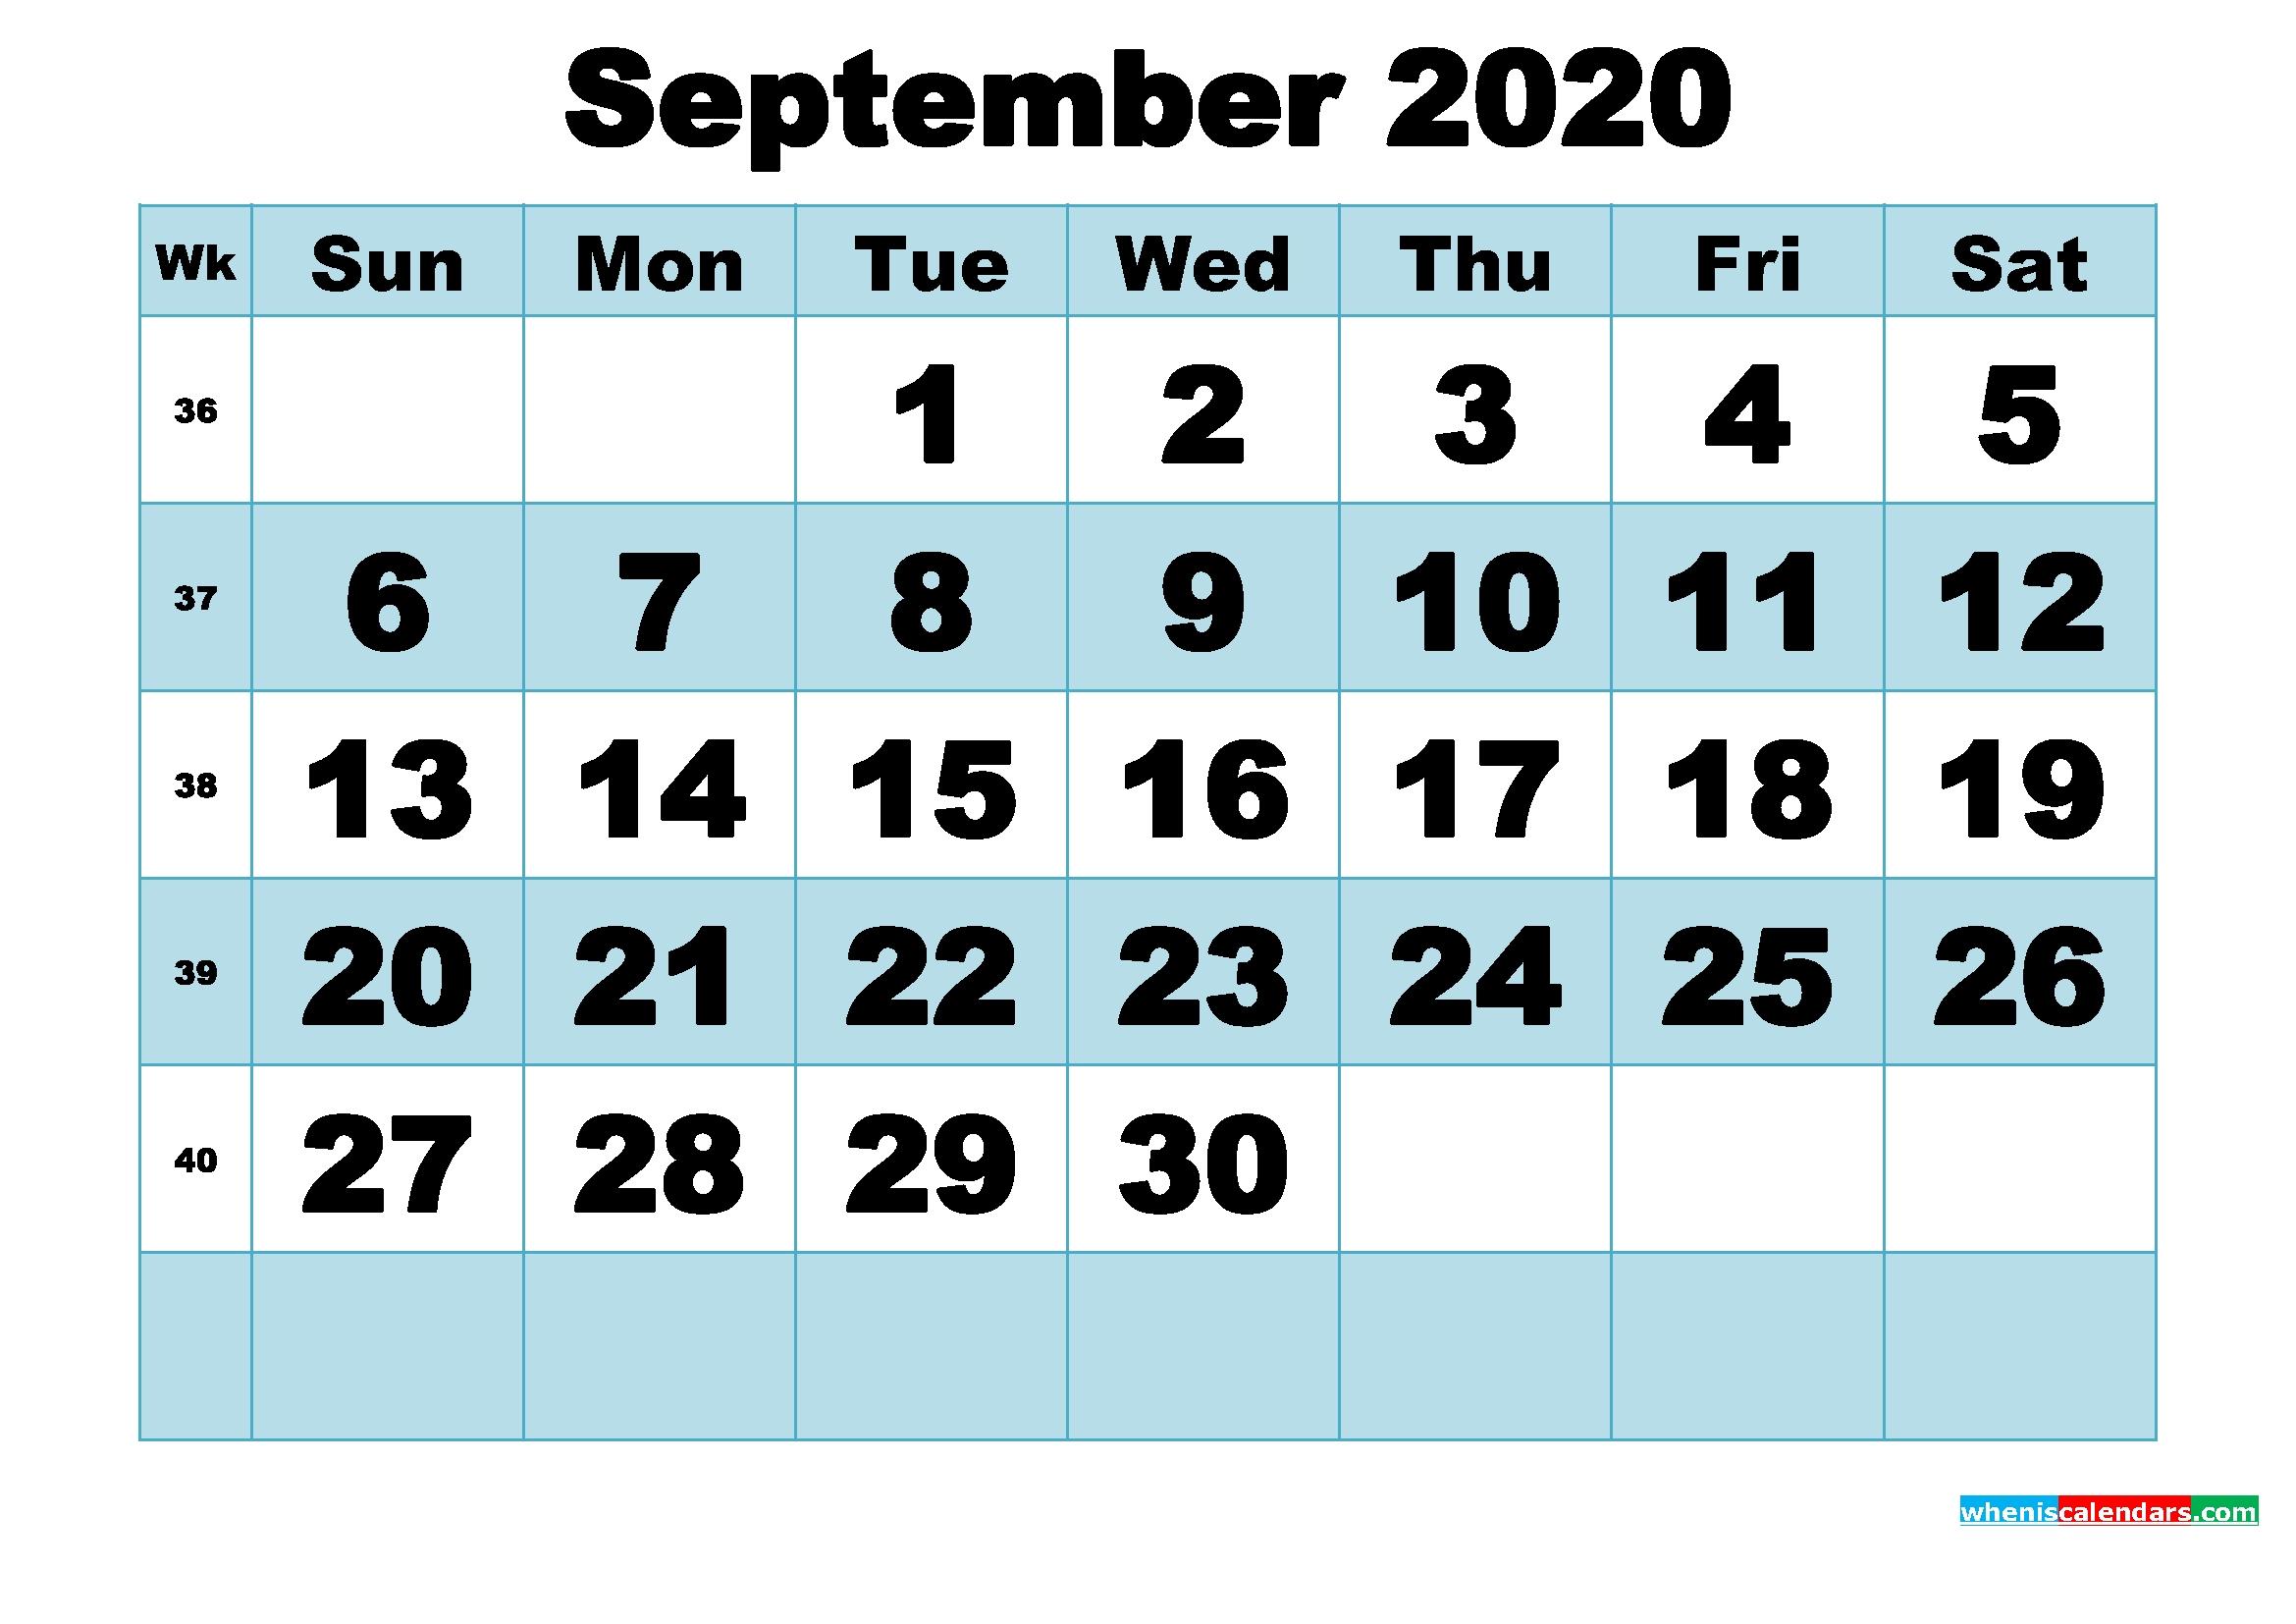 Free Printable September 2020 Calendar Word, Pdf, Image | Free Printable 2020 Calendar With Holidays September 2020 To September 2021 Calendar